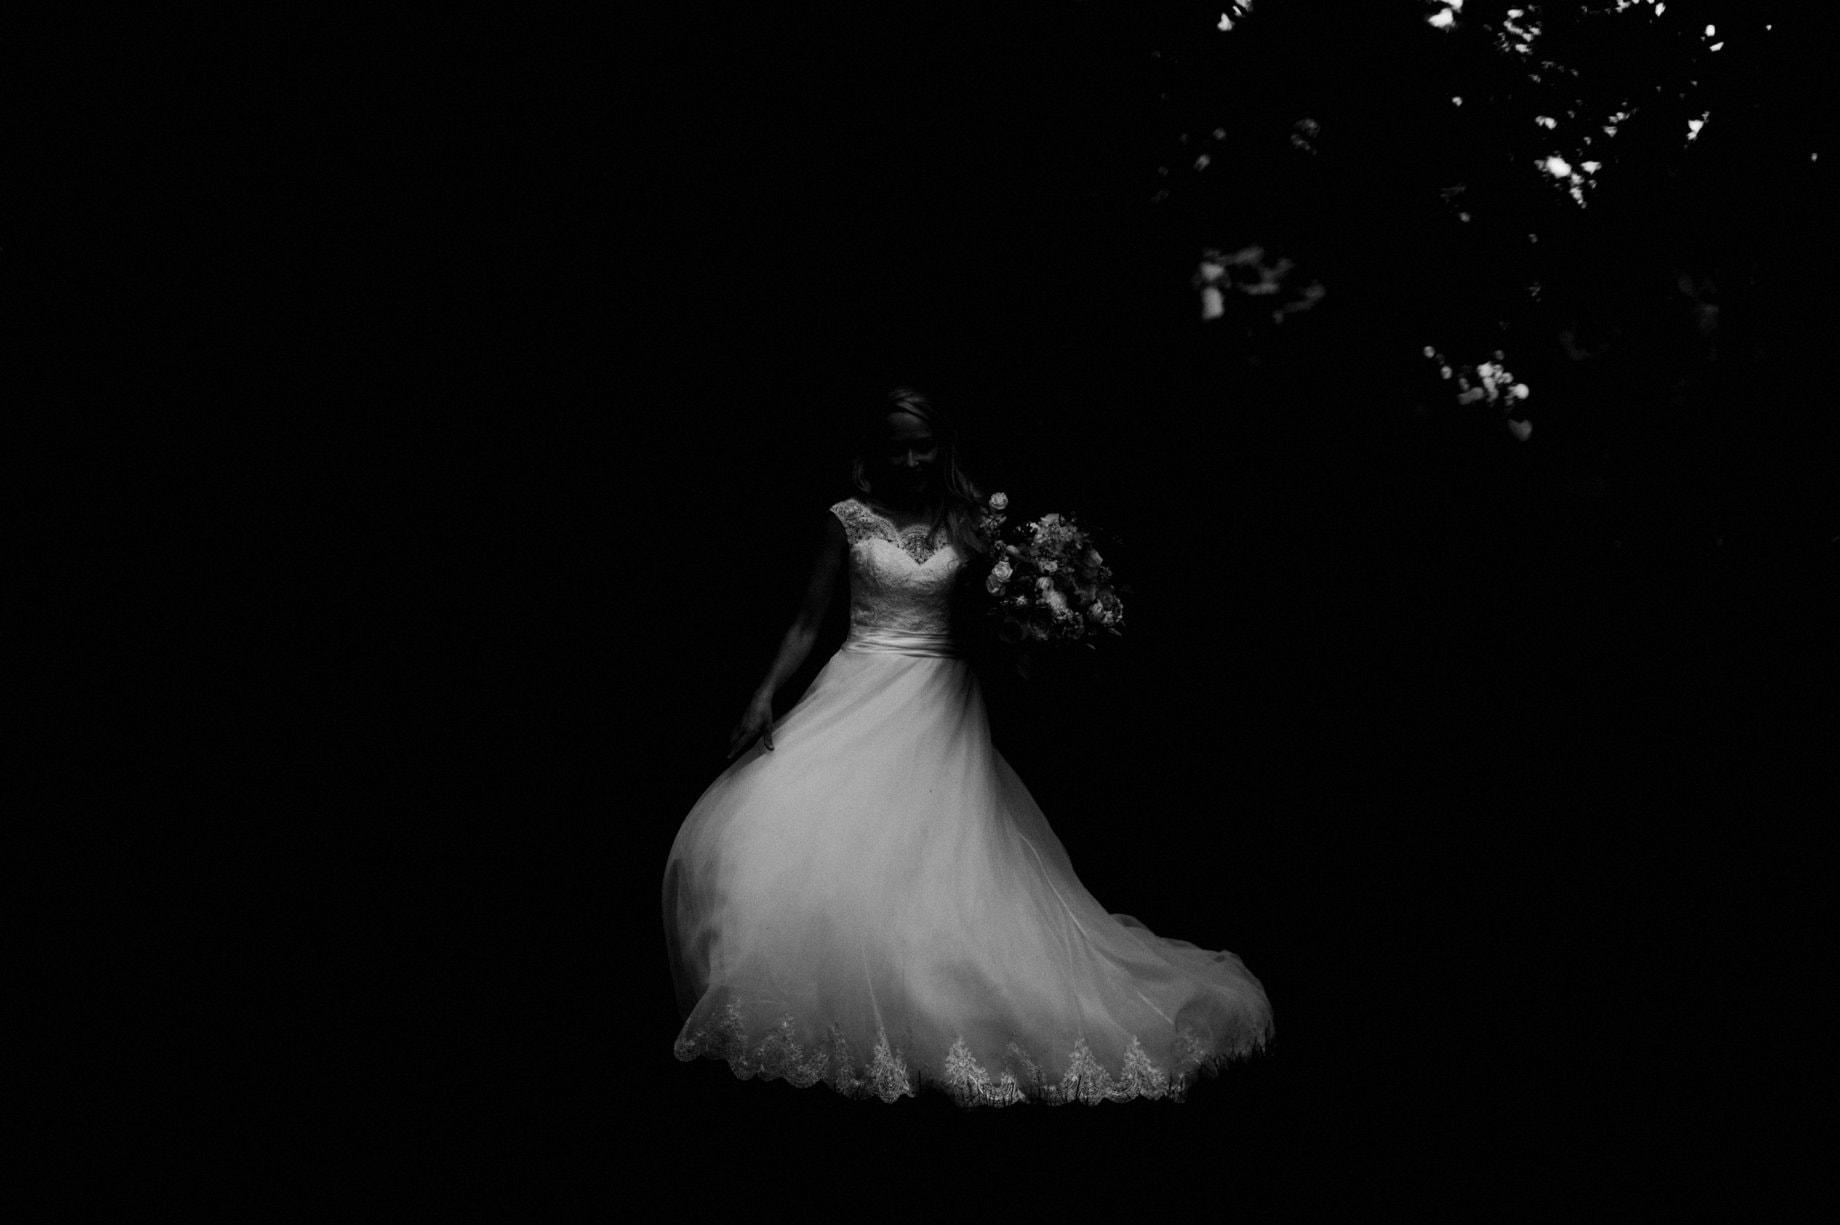 abstract wedding dress photograph